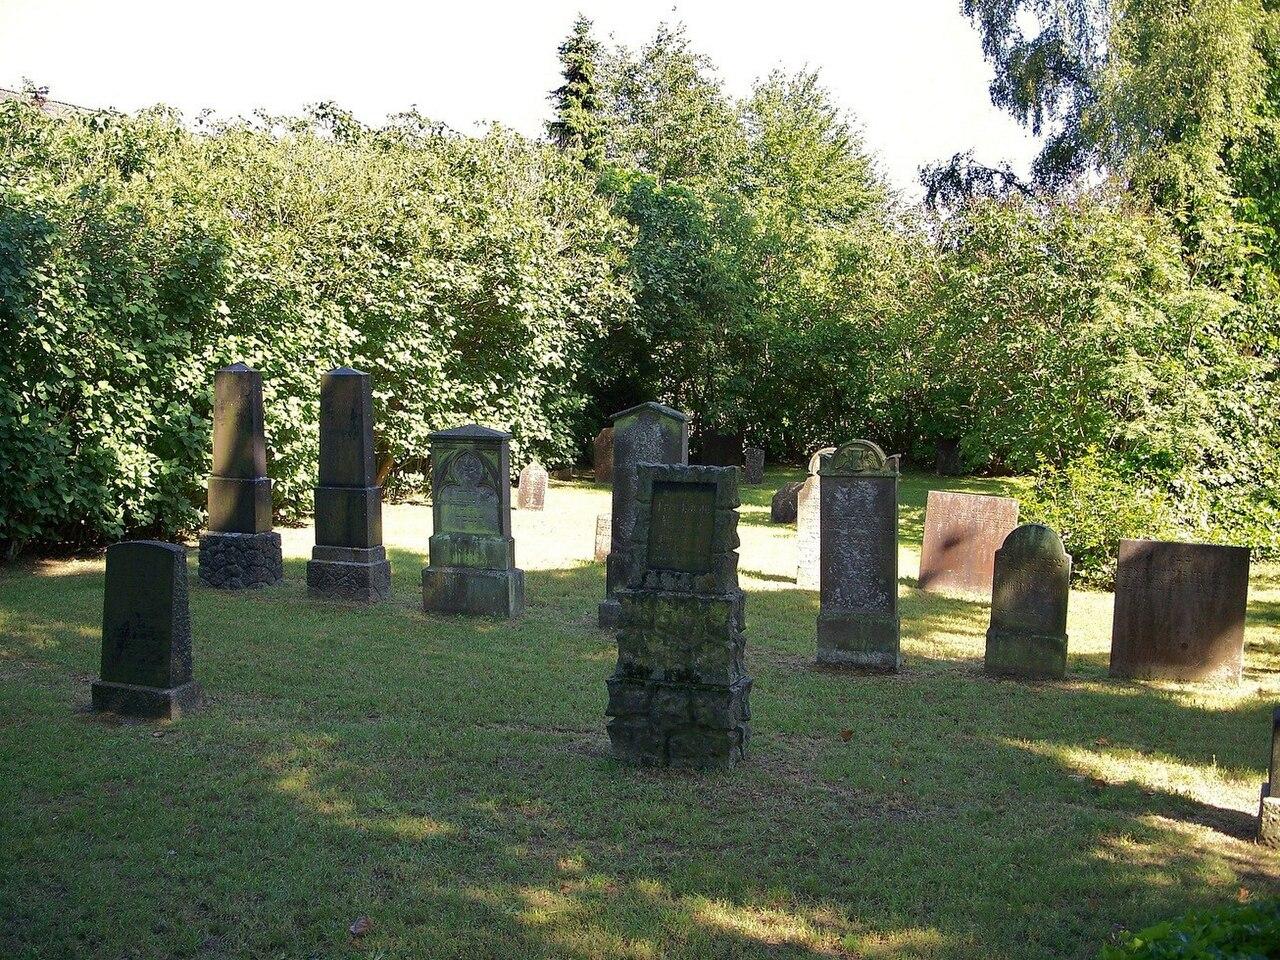 Jfriedhof stodo.jpg